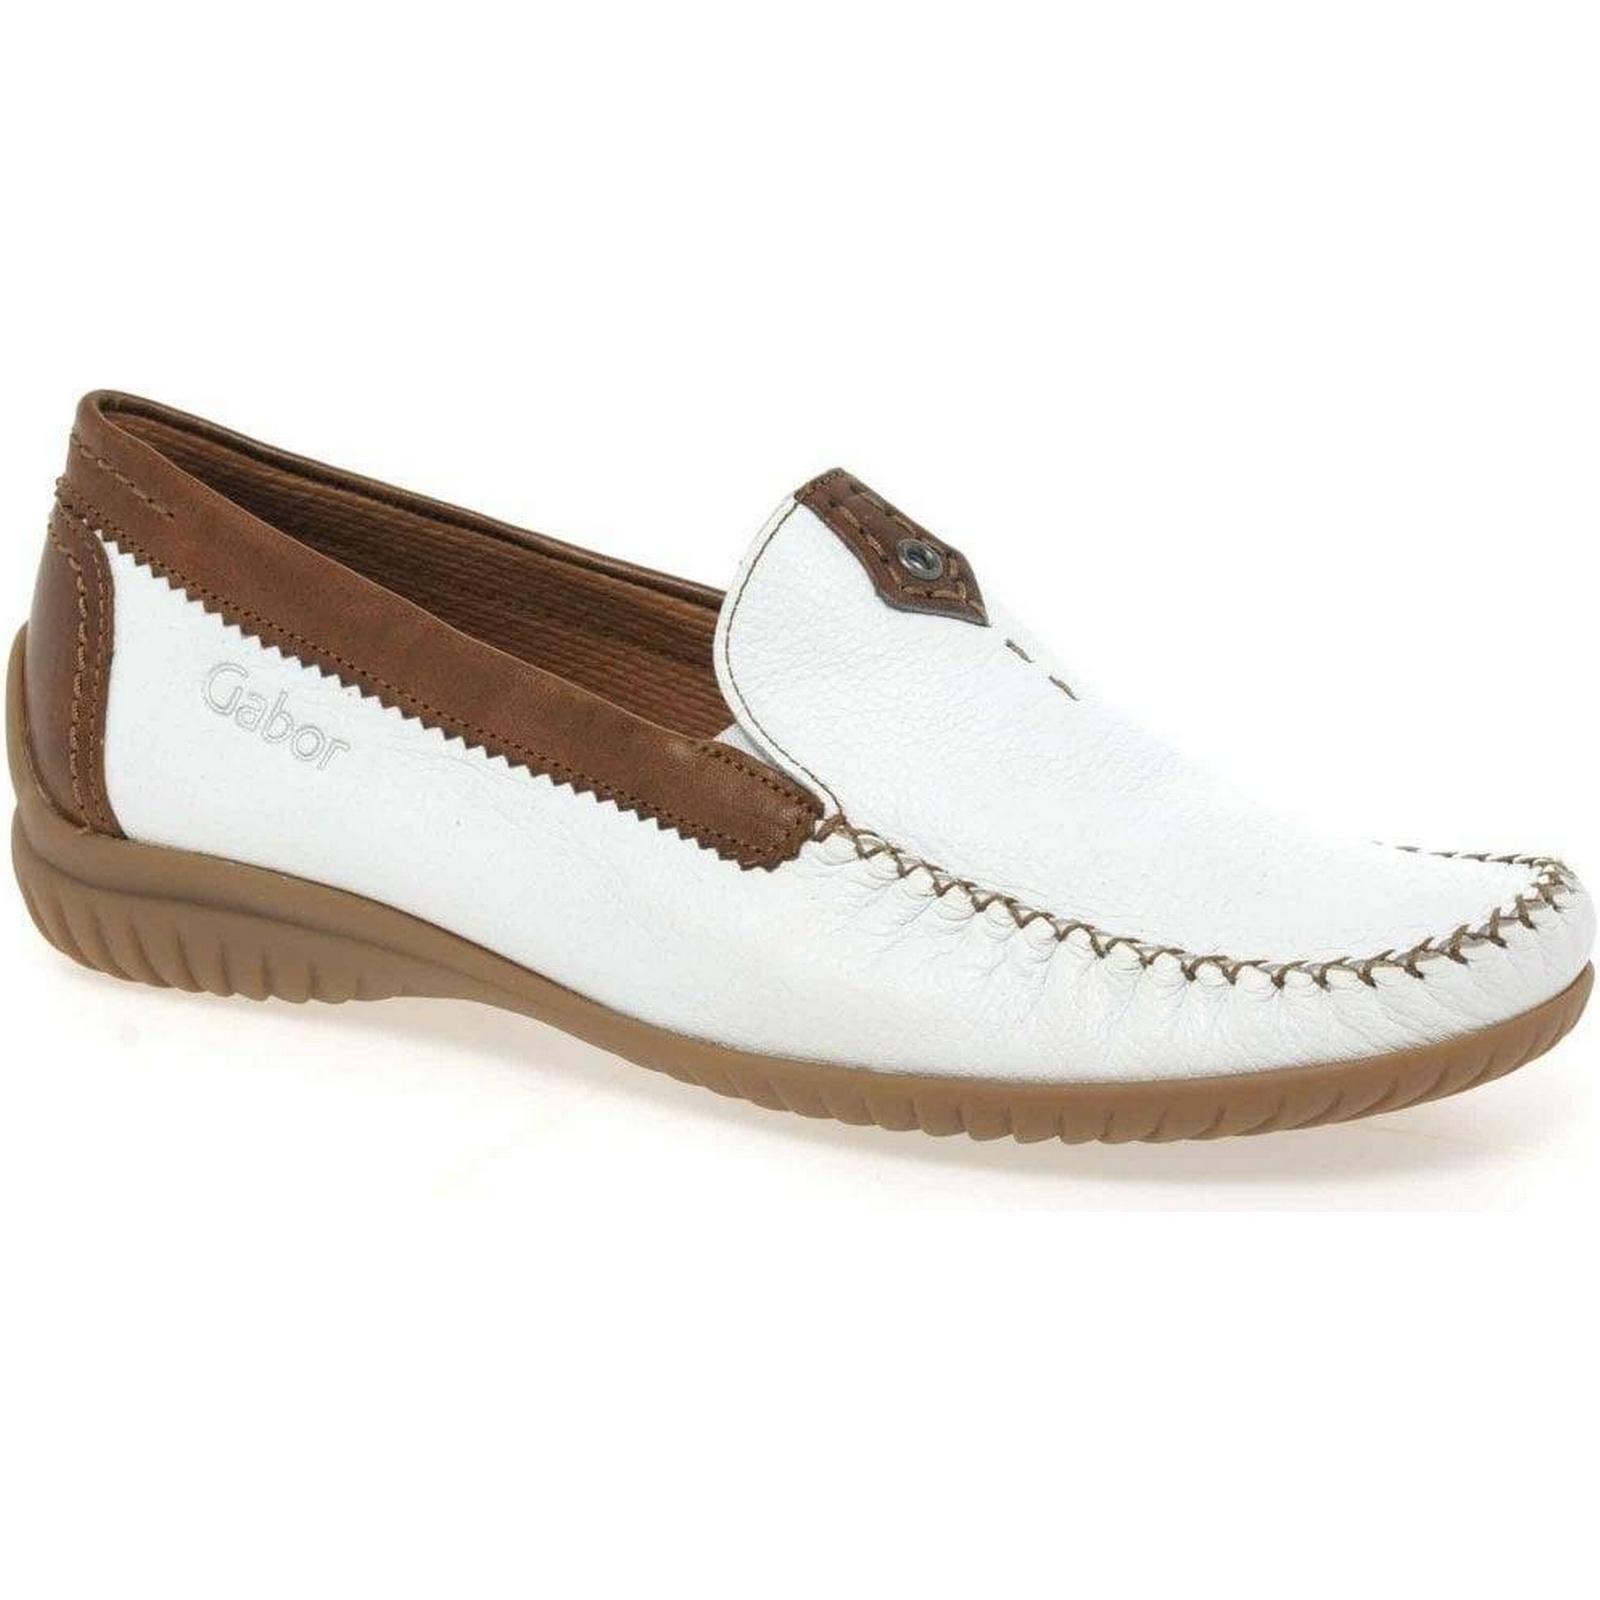 Gabor California 66.090 White Size: Casual Shoe Colour: White, Size: White 9 328055